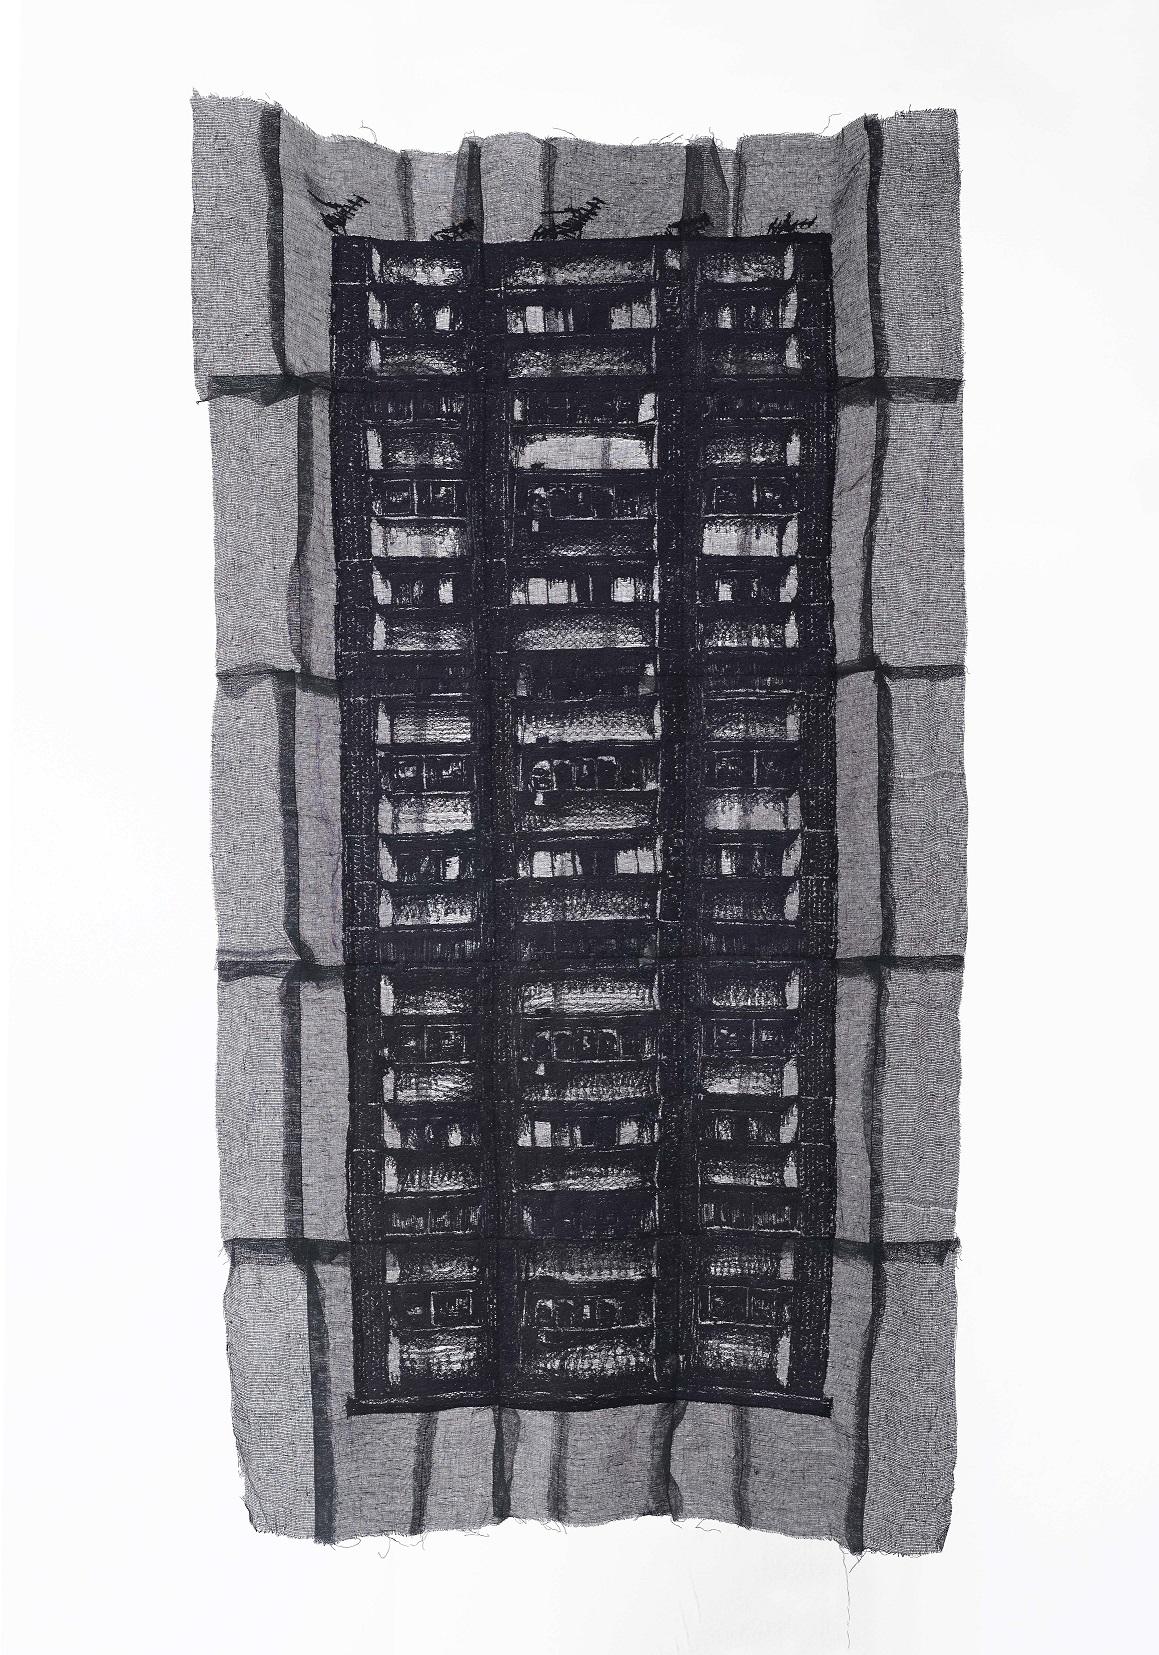 Yim Yen Sum - The Faded Memories II (2018) Embroidery on gauze, gauze dyed in acrylic; 128cm(H) x 69cm(W)